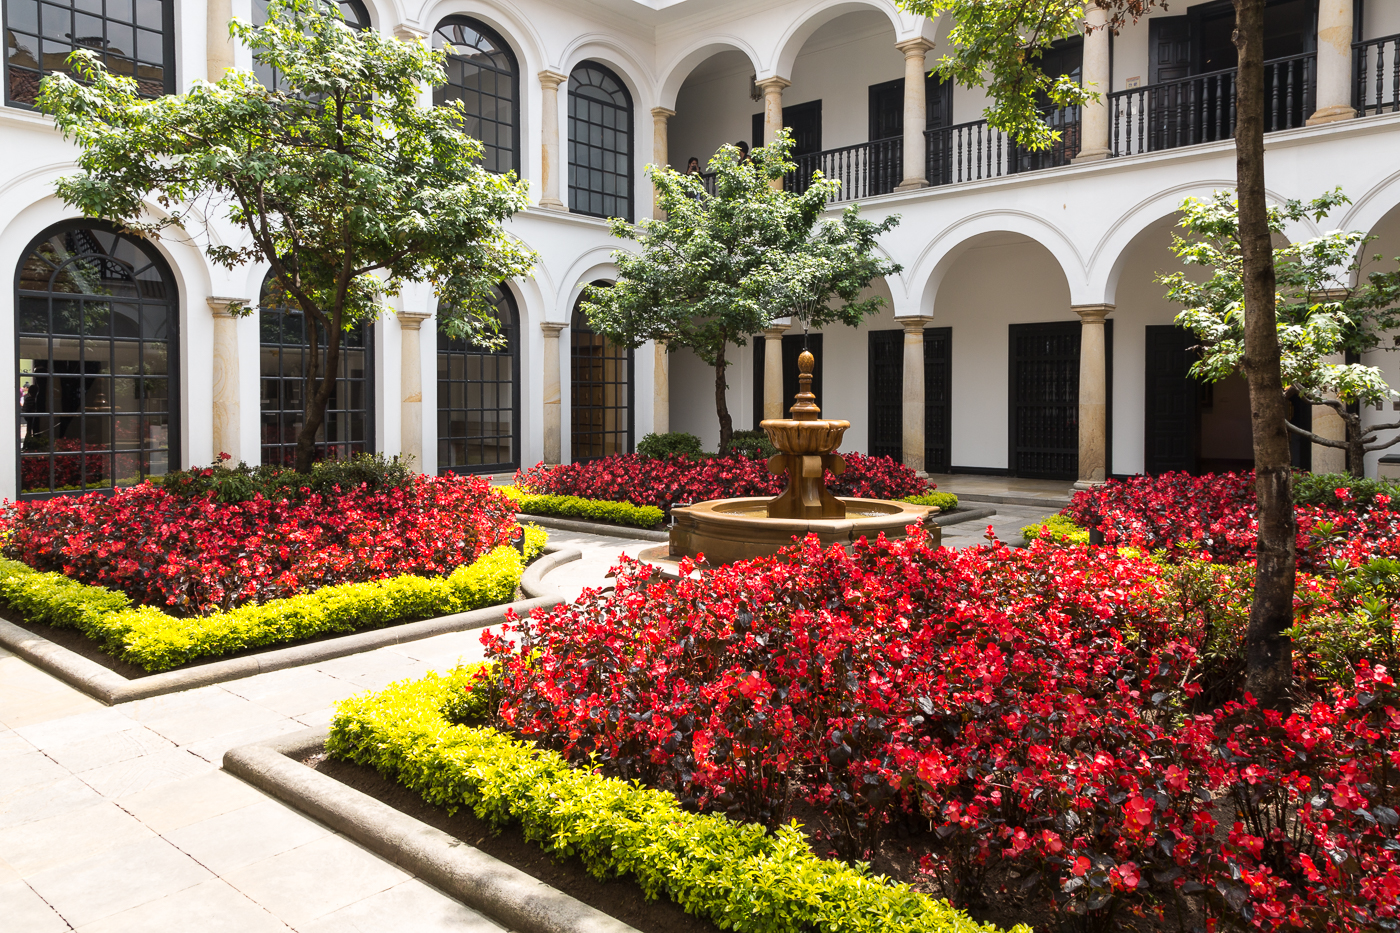 Inner Courtyard of the Botero Museum, Bogata